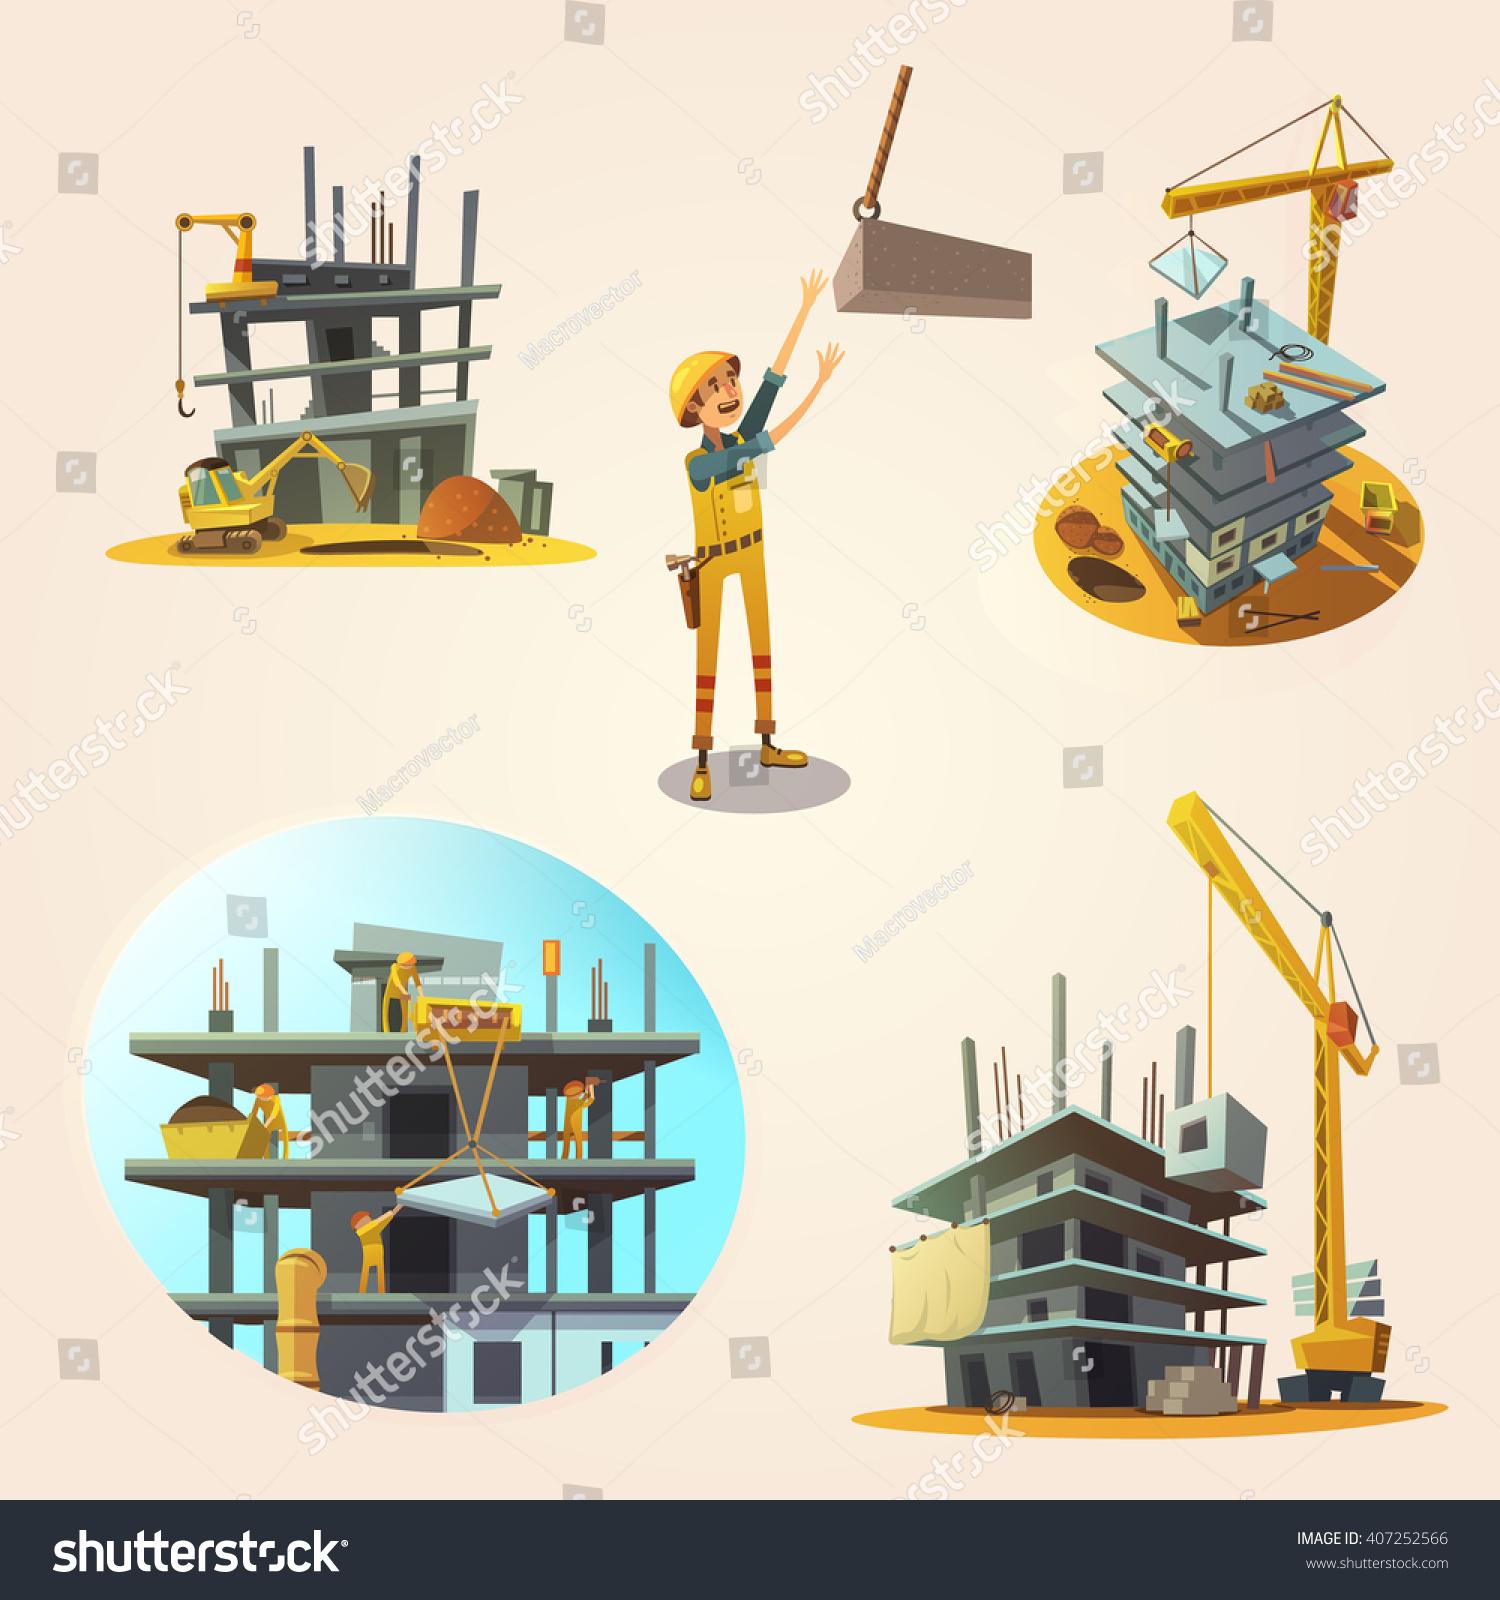 Building Construction Cartoon : Construction concept set building process retro stock